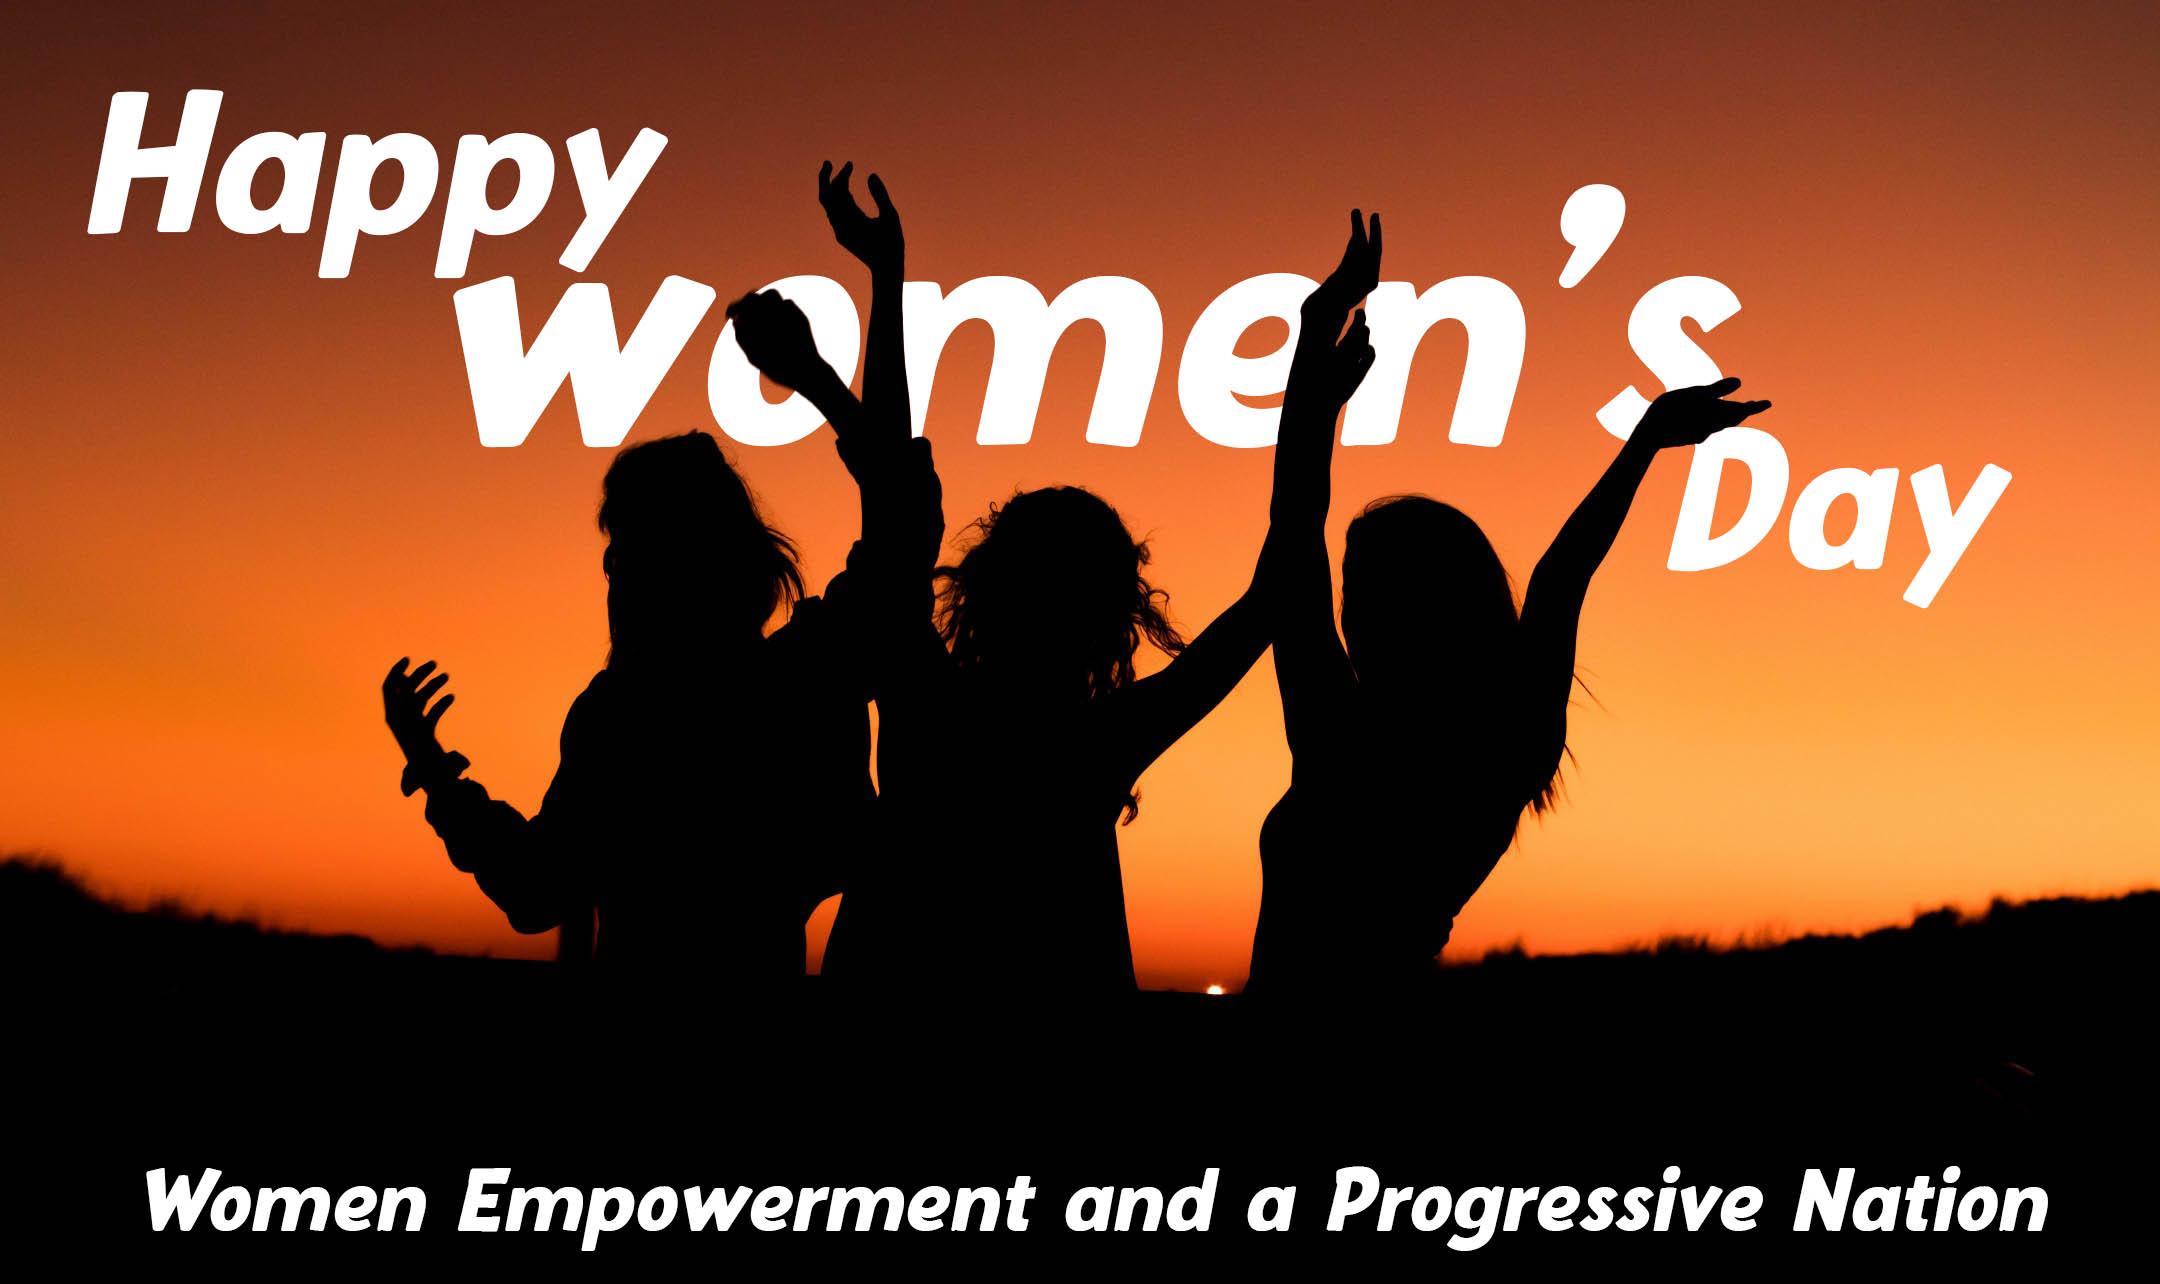 Women Empowerment and a Progressive Nation